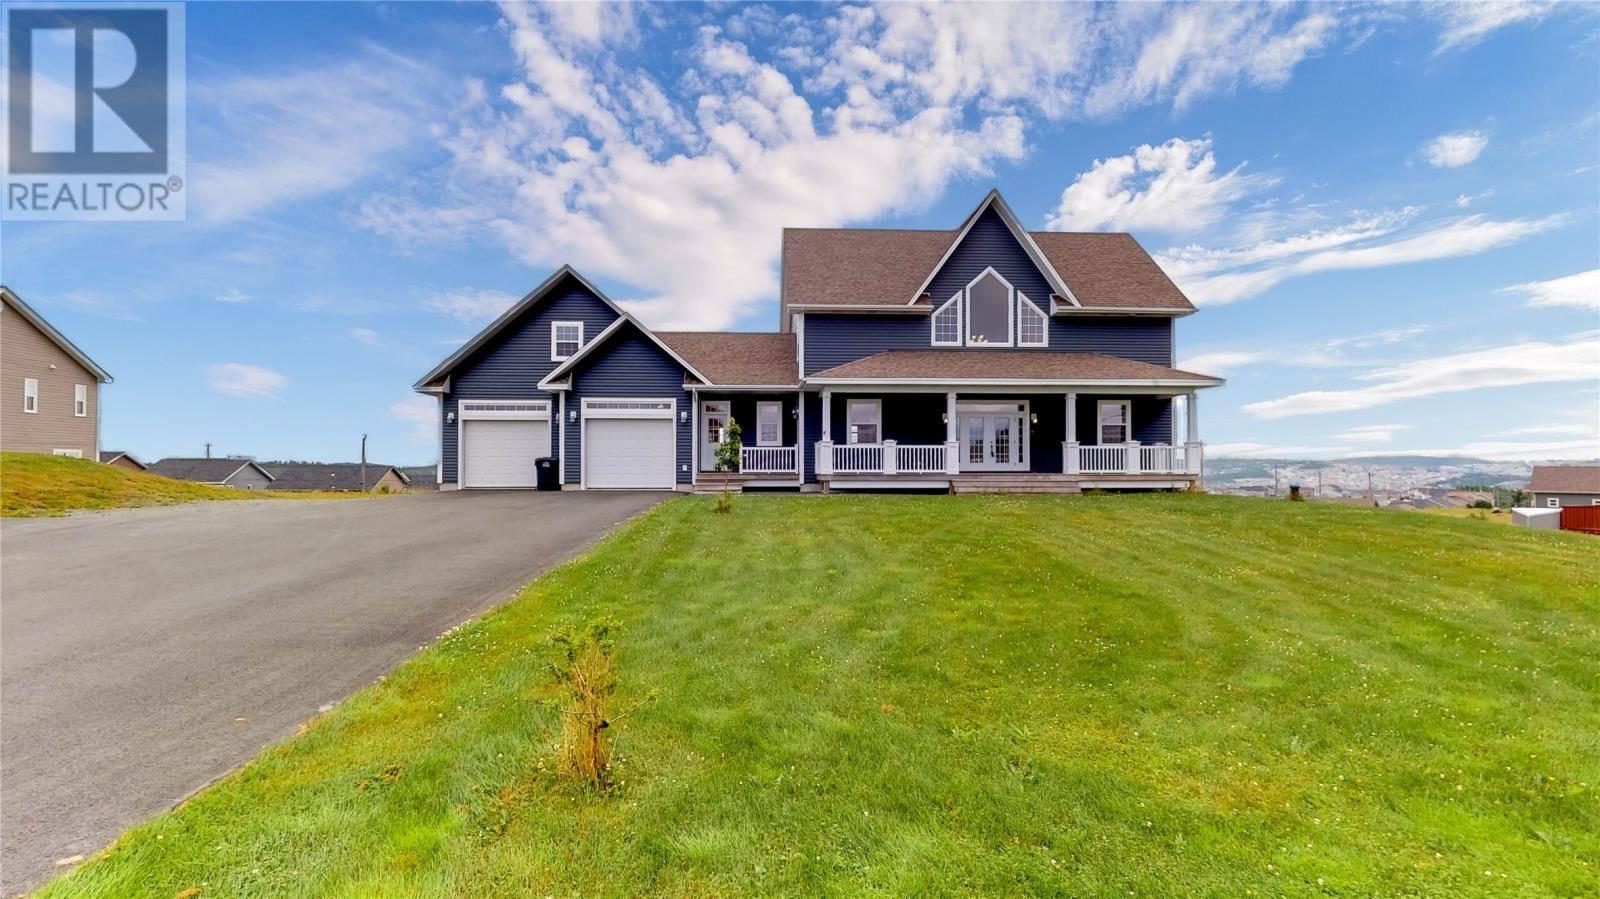 House for sale at 96 Ridgewood Dr Paradise Newfoundland - MLS: 1209151